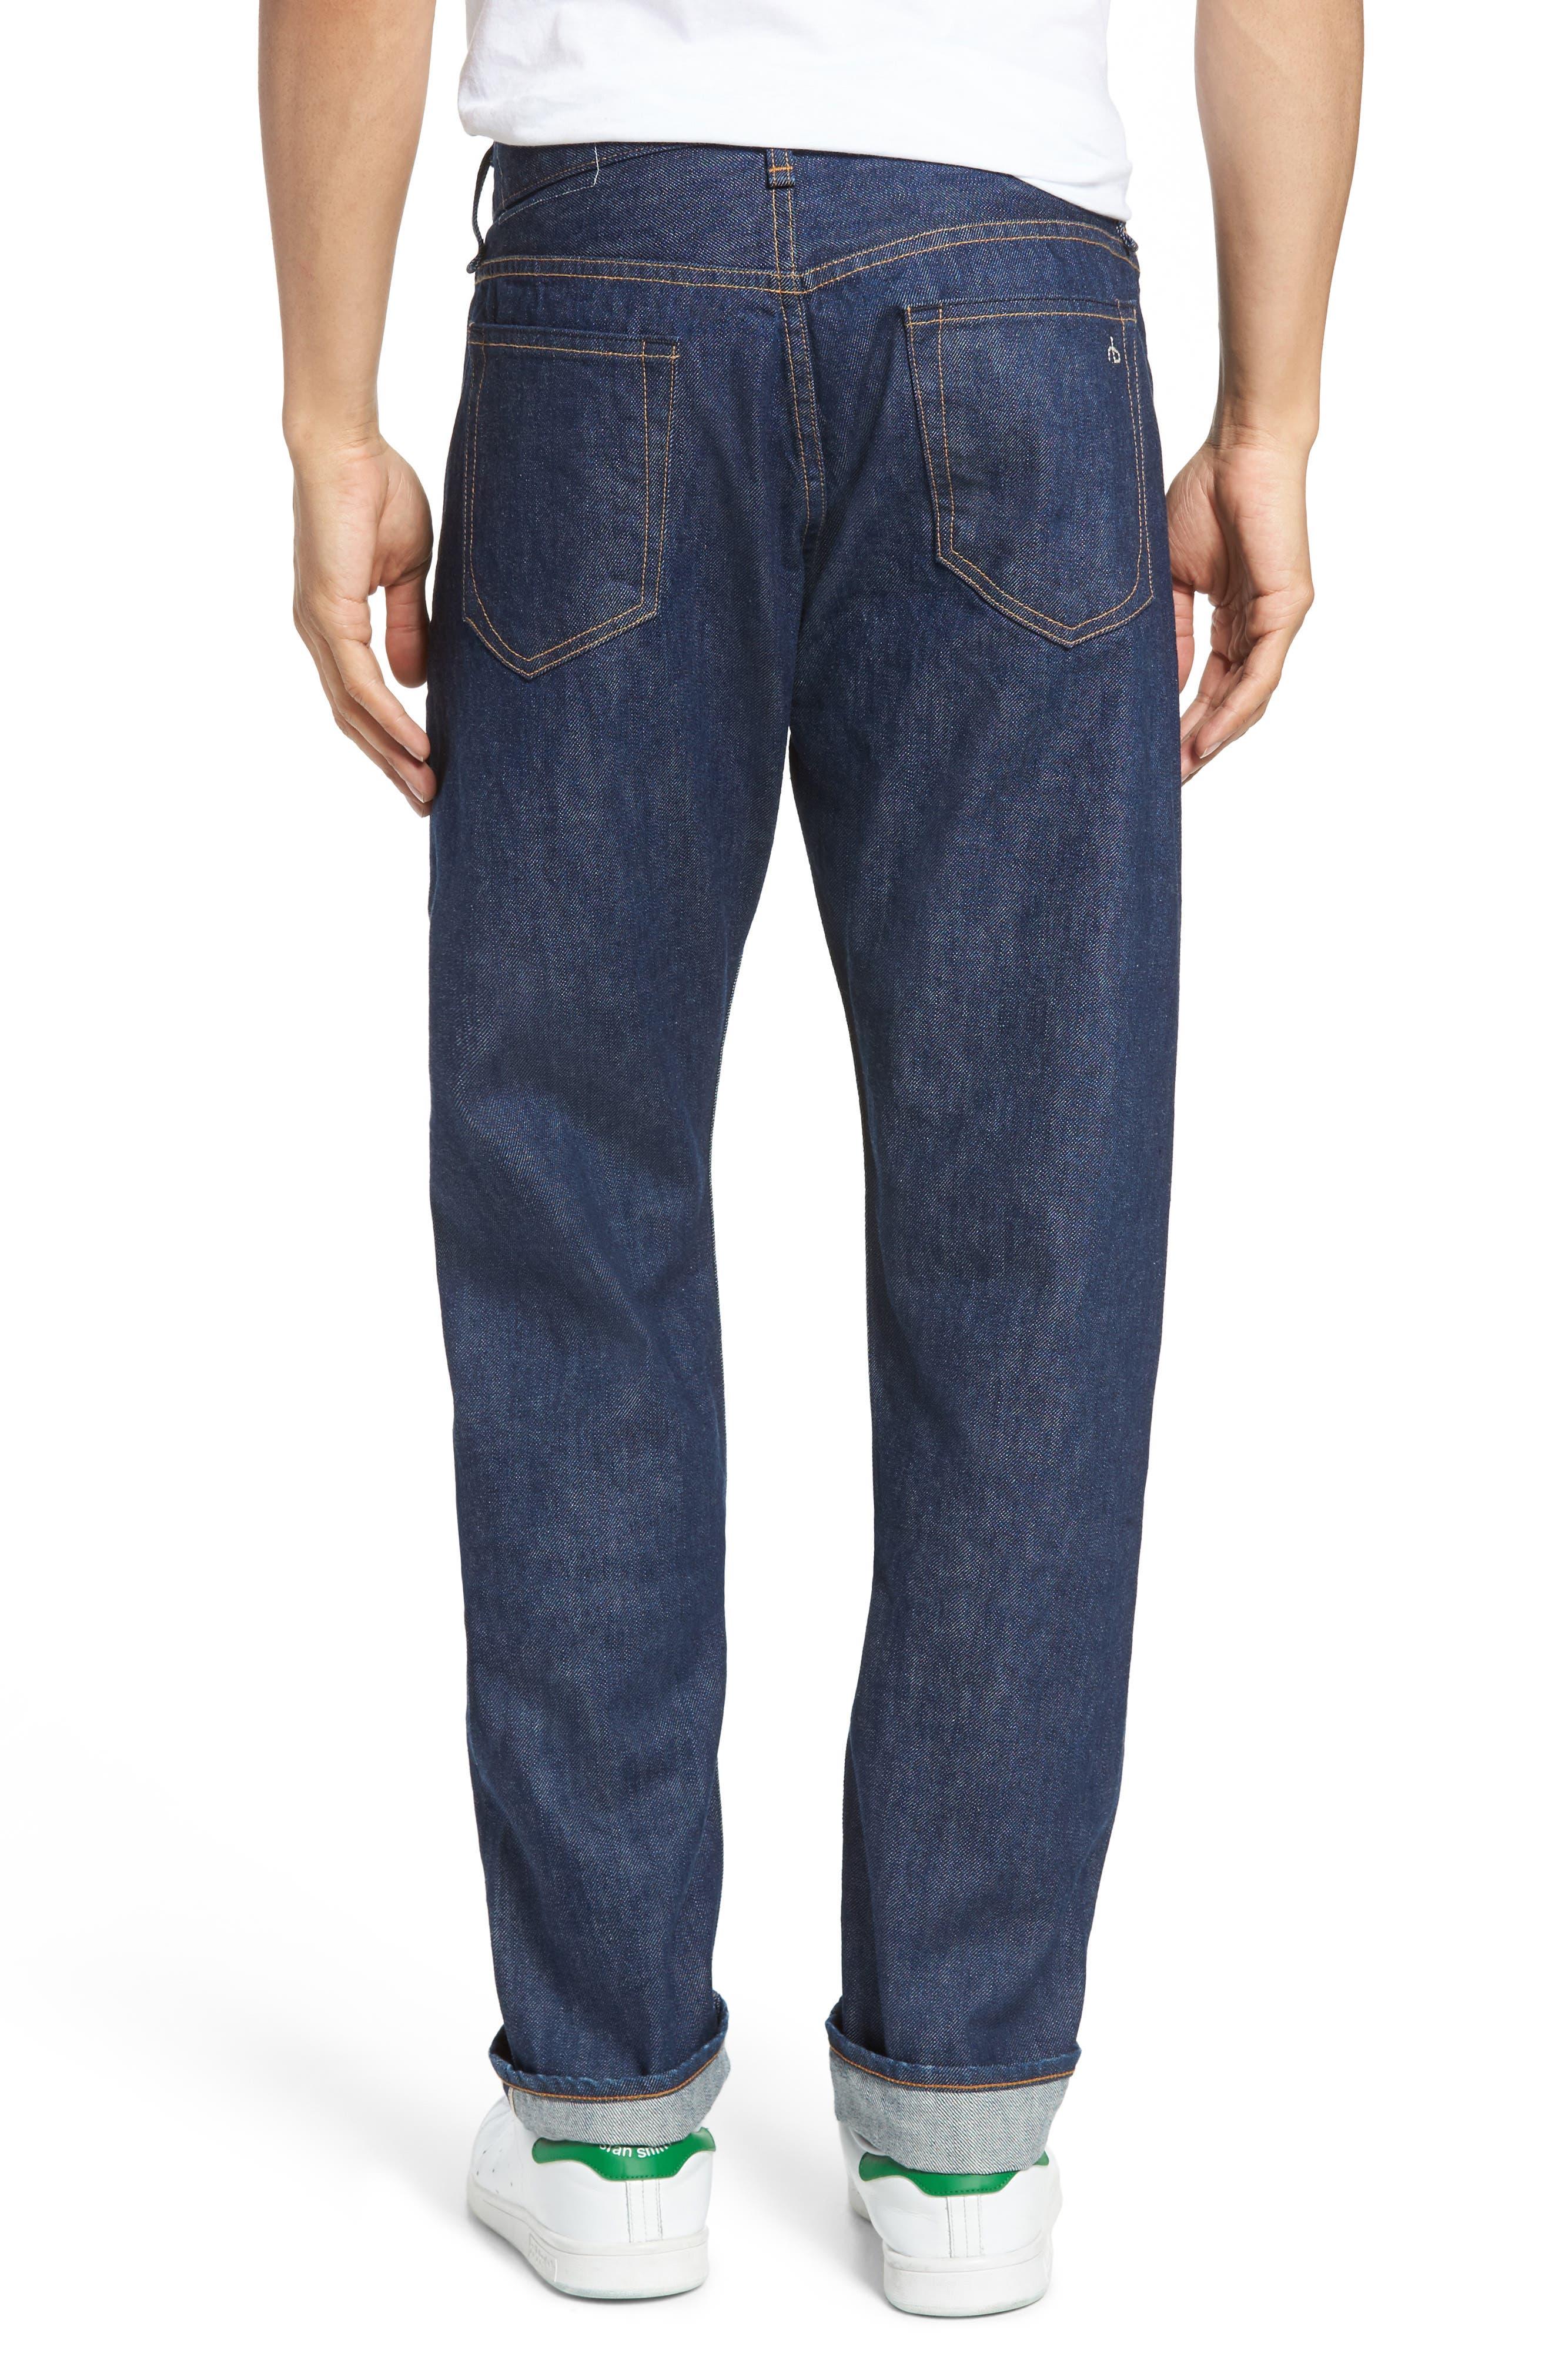 Fit 2 Slim Fit Selvedge Jeans,                             Alternate thumbnail 2, color,                             427